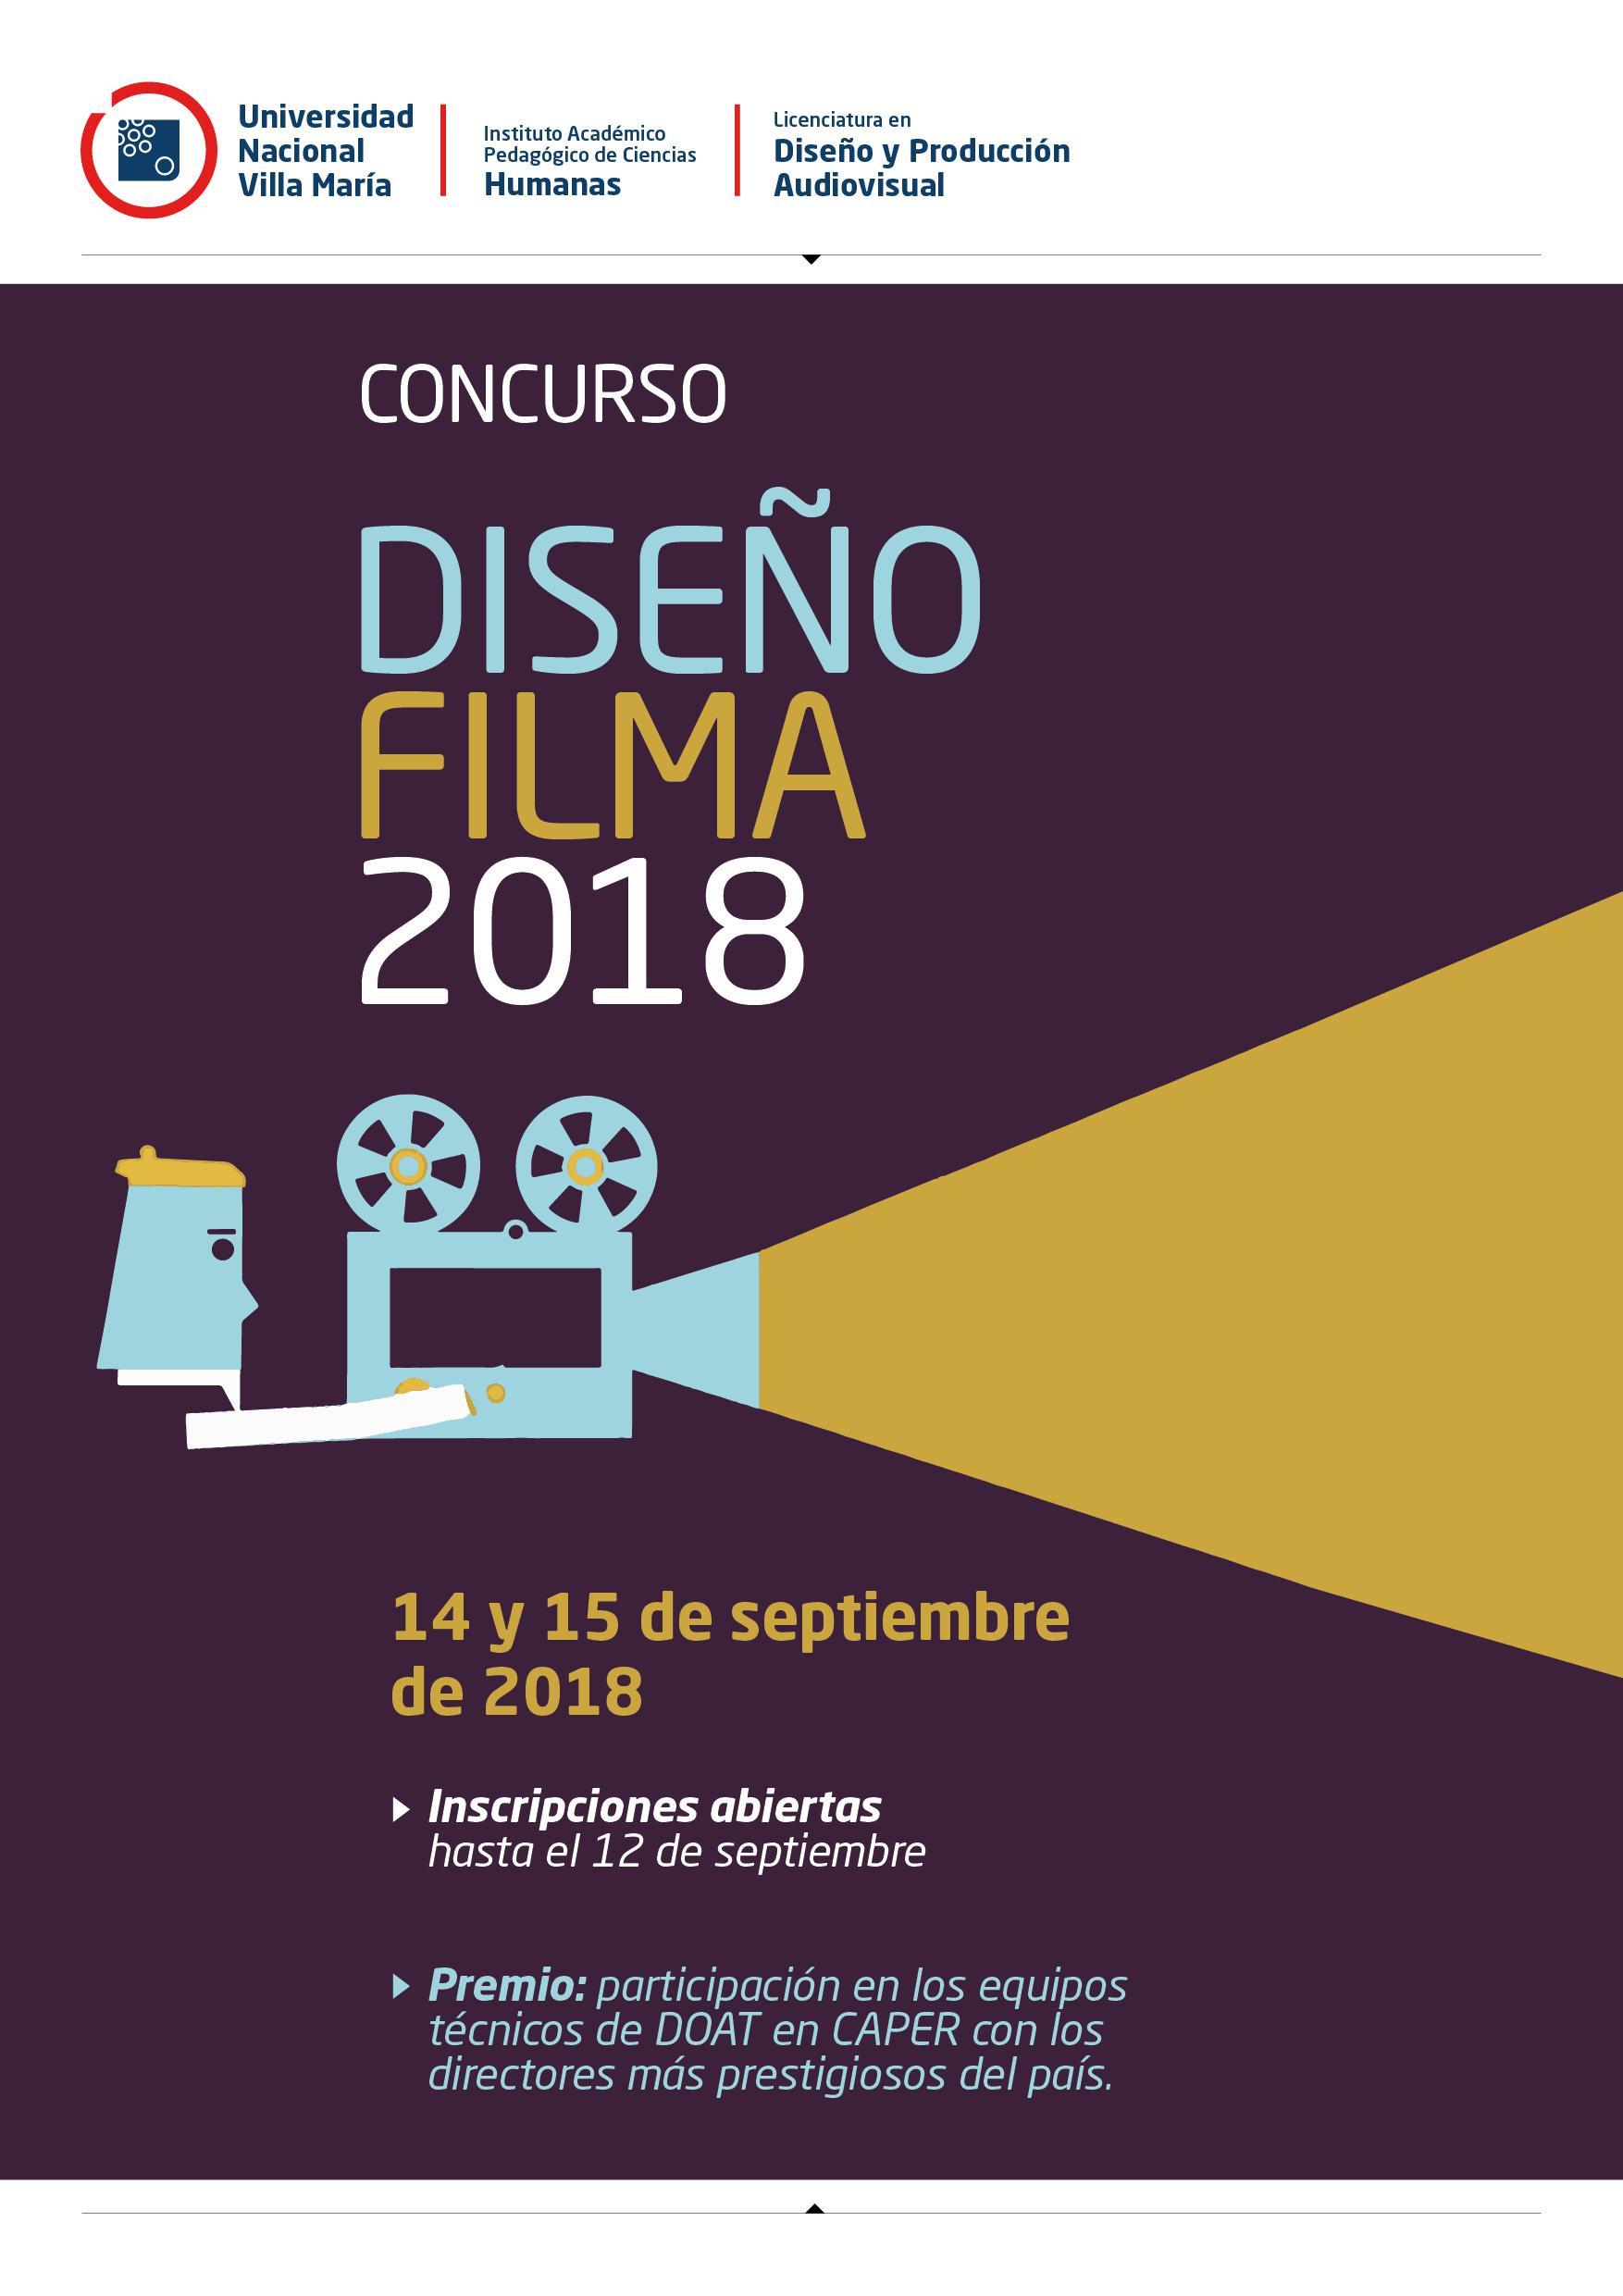 Diseño Filma 2018-01